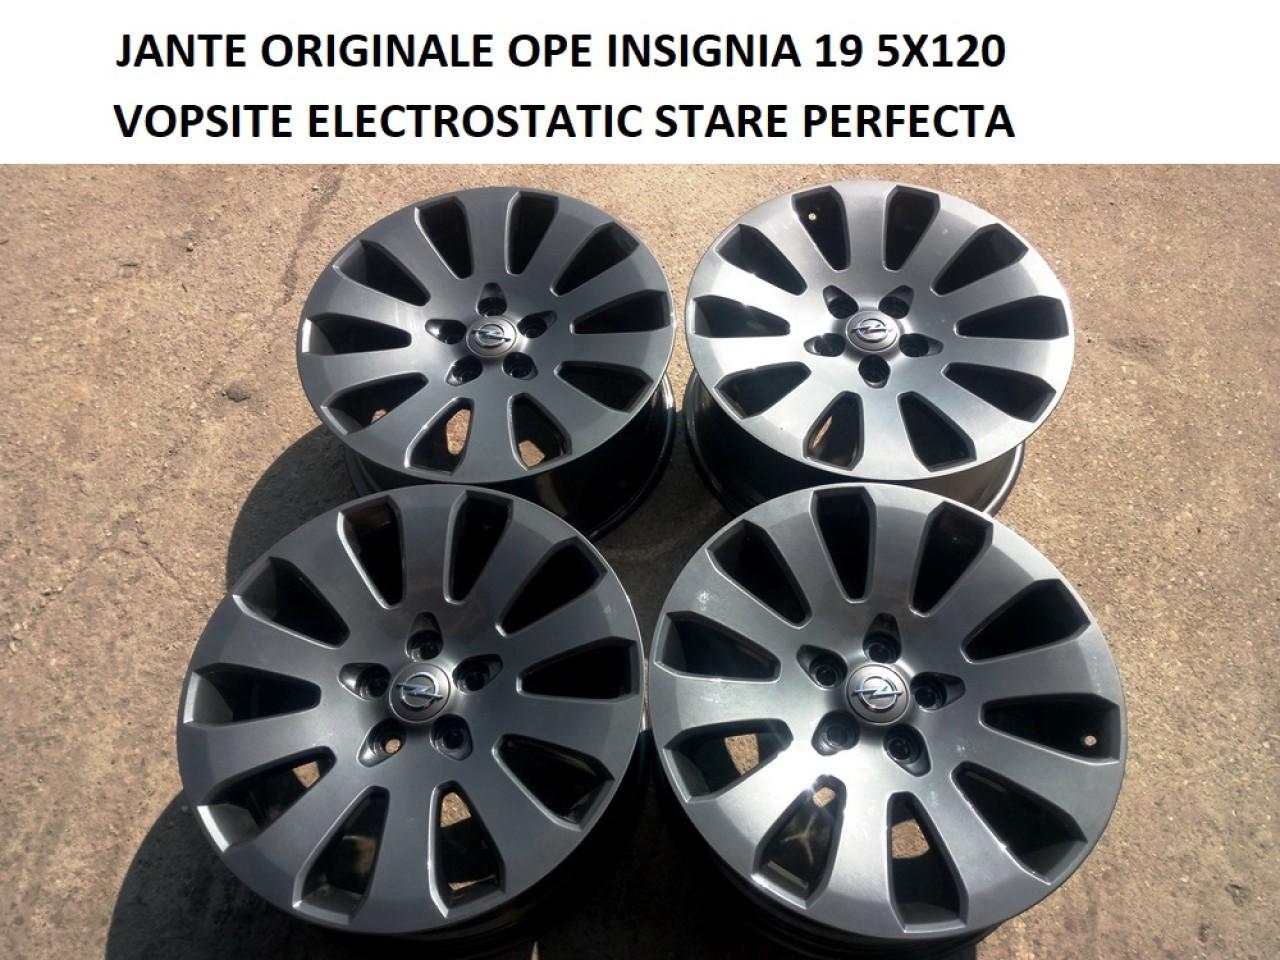 JANTE ORIGINALE OPEL INSIGNIA 19 5X120